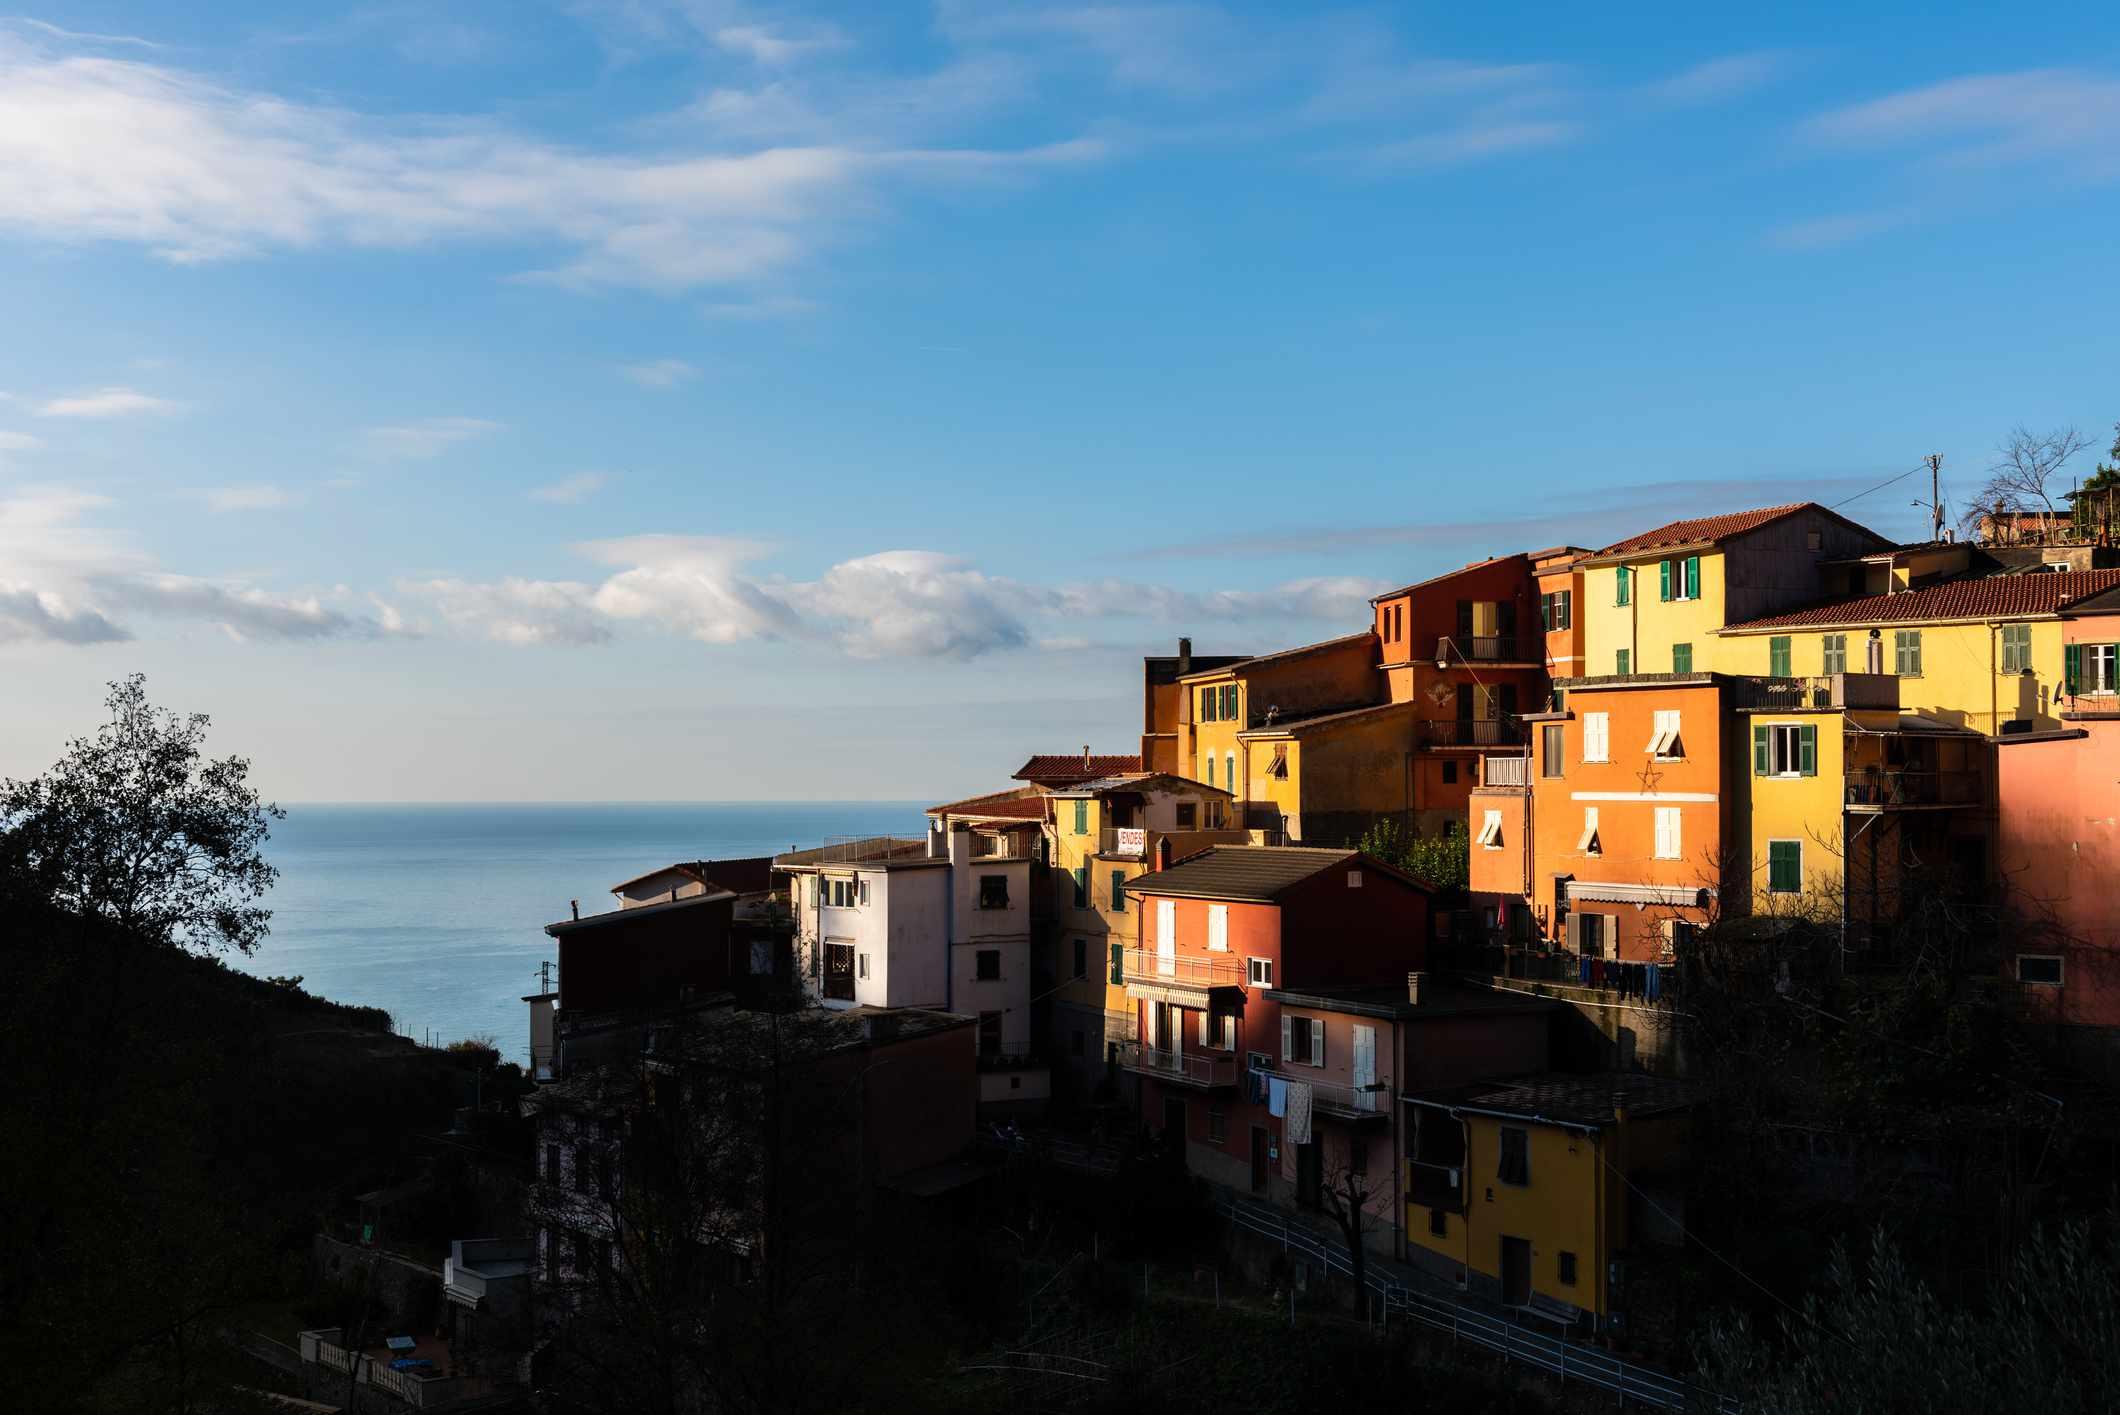 Village of Groppo, Cinque Terre